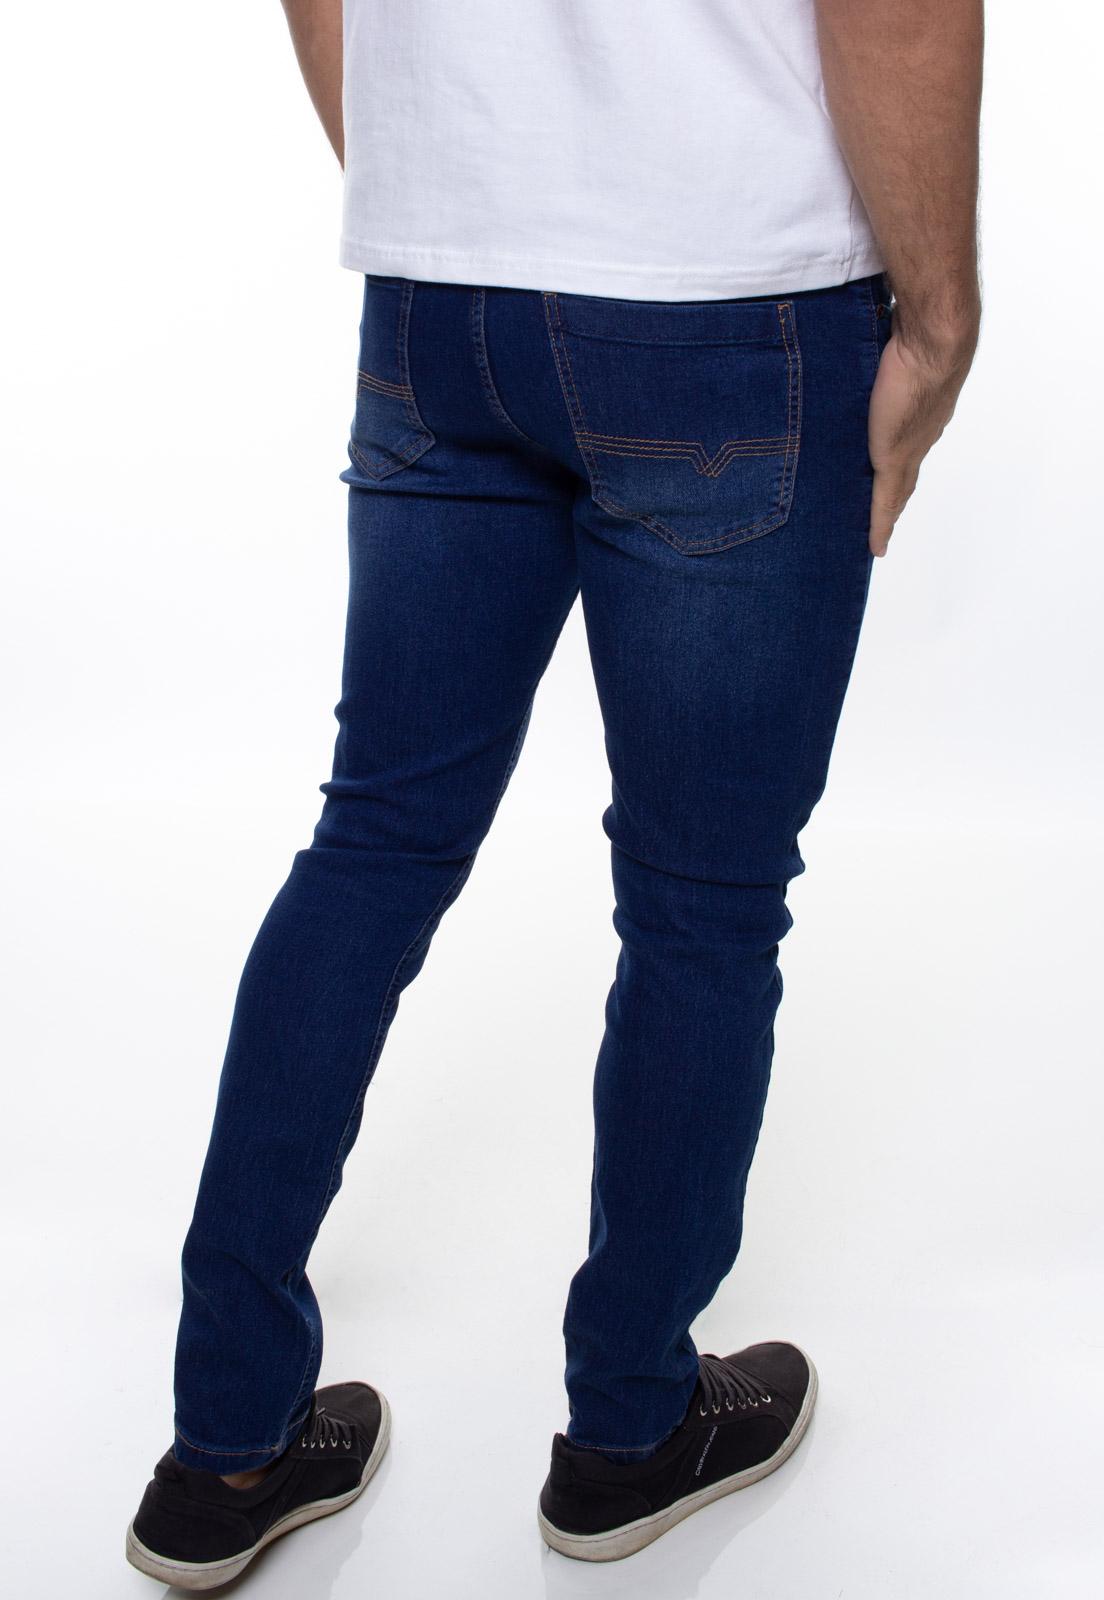 Calça Confort Jeans Masculina Crocker - 48051  - CROCKER JEANS